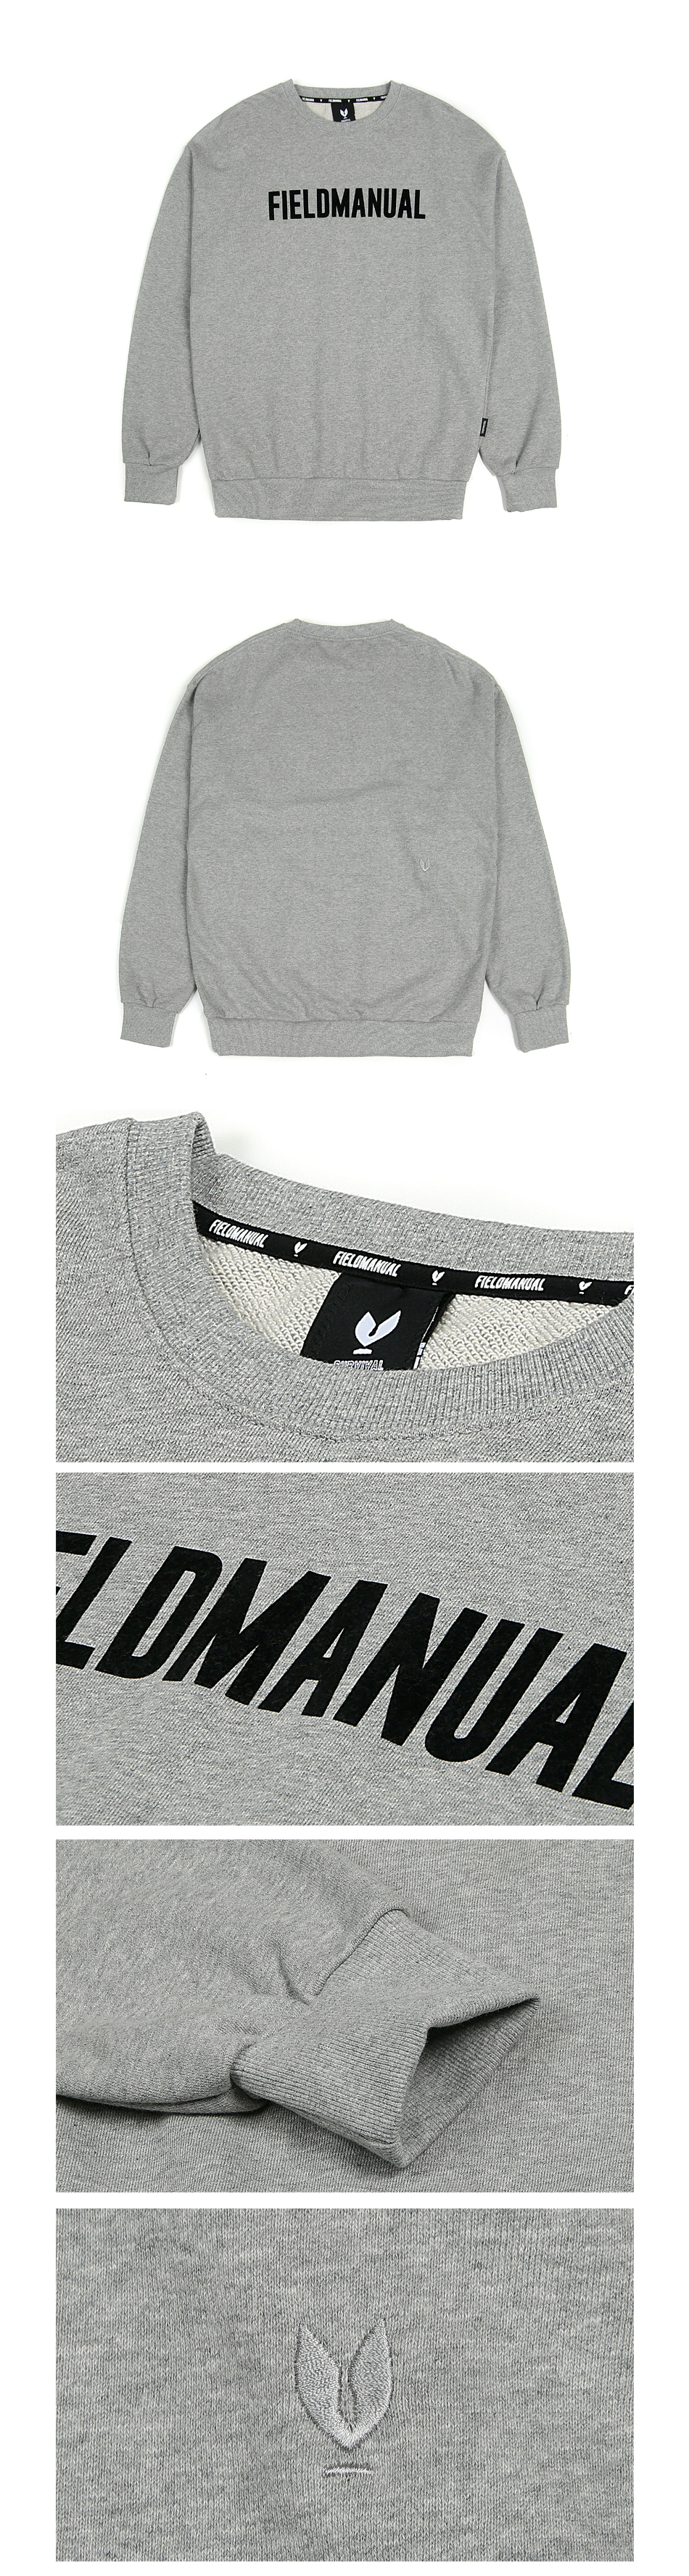 18fw_flocked-logo-sweatshirt-grey_950.jpg